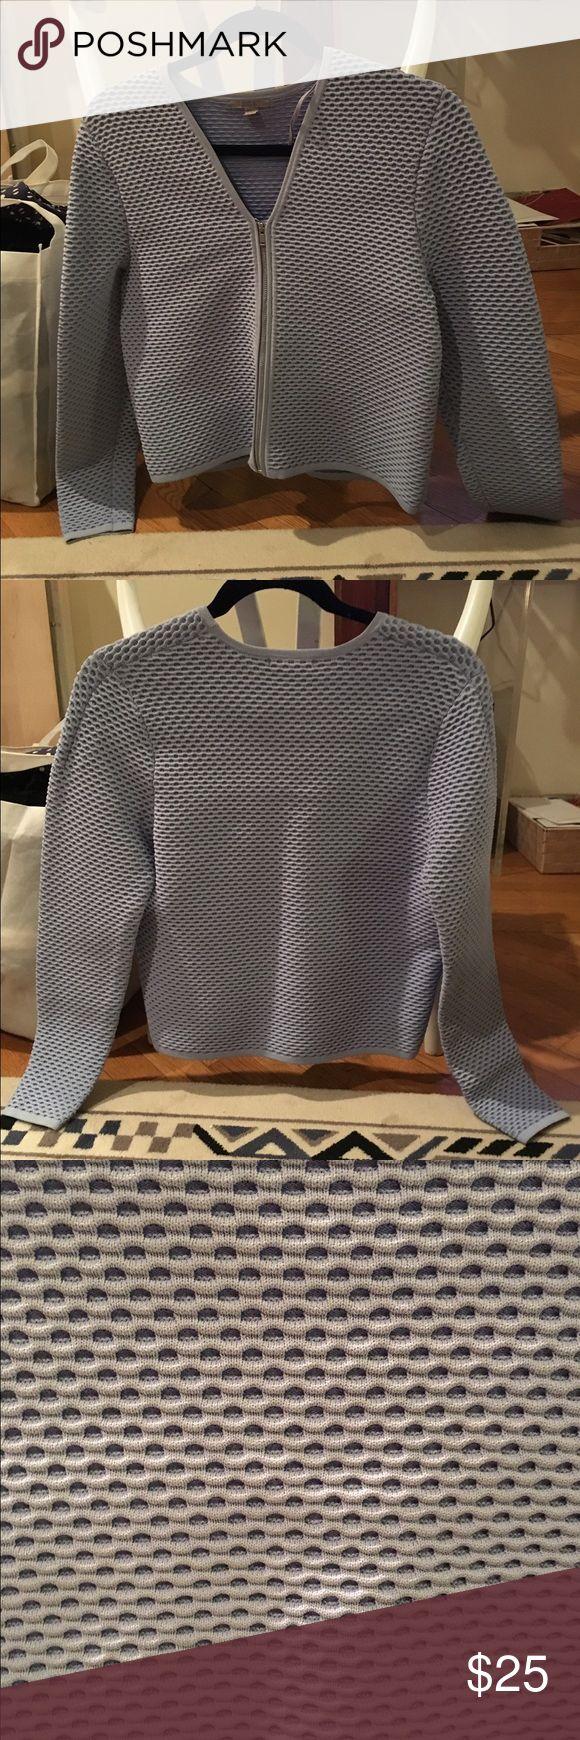 COS waffle light blue jacket, size S Amazing structural COS jacket in light blue. Size 4 (S). In near perfect condition. COS Jackets & Coats